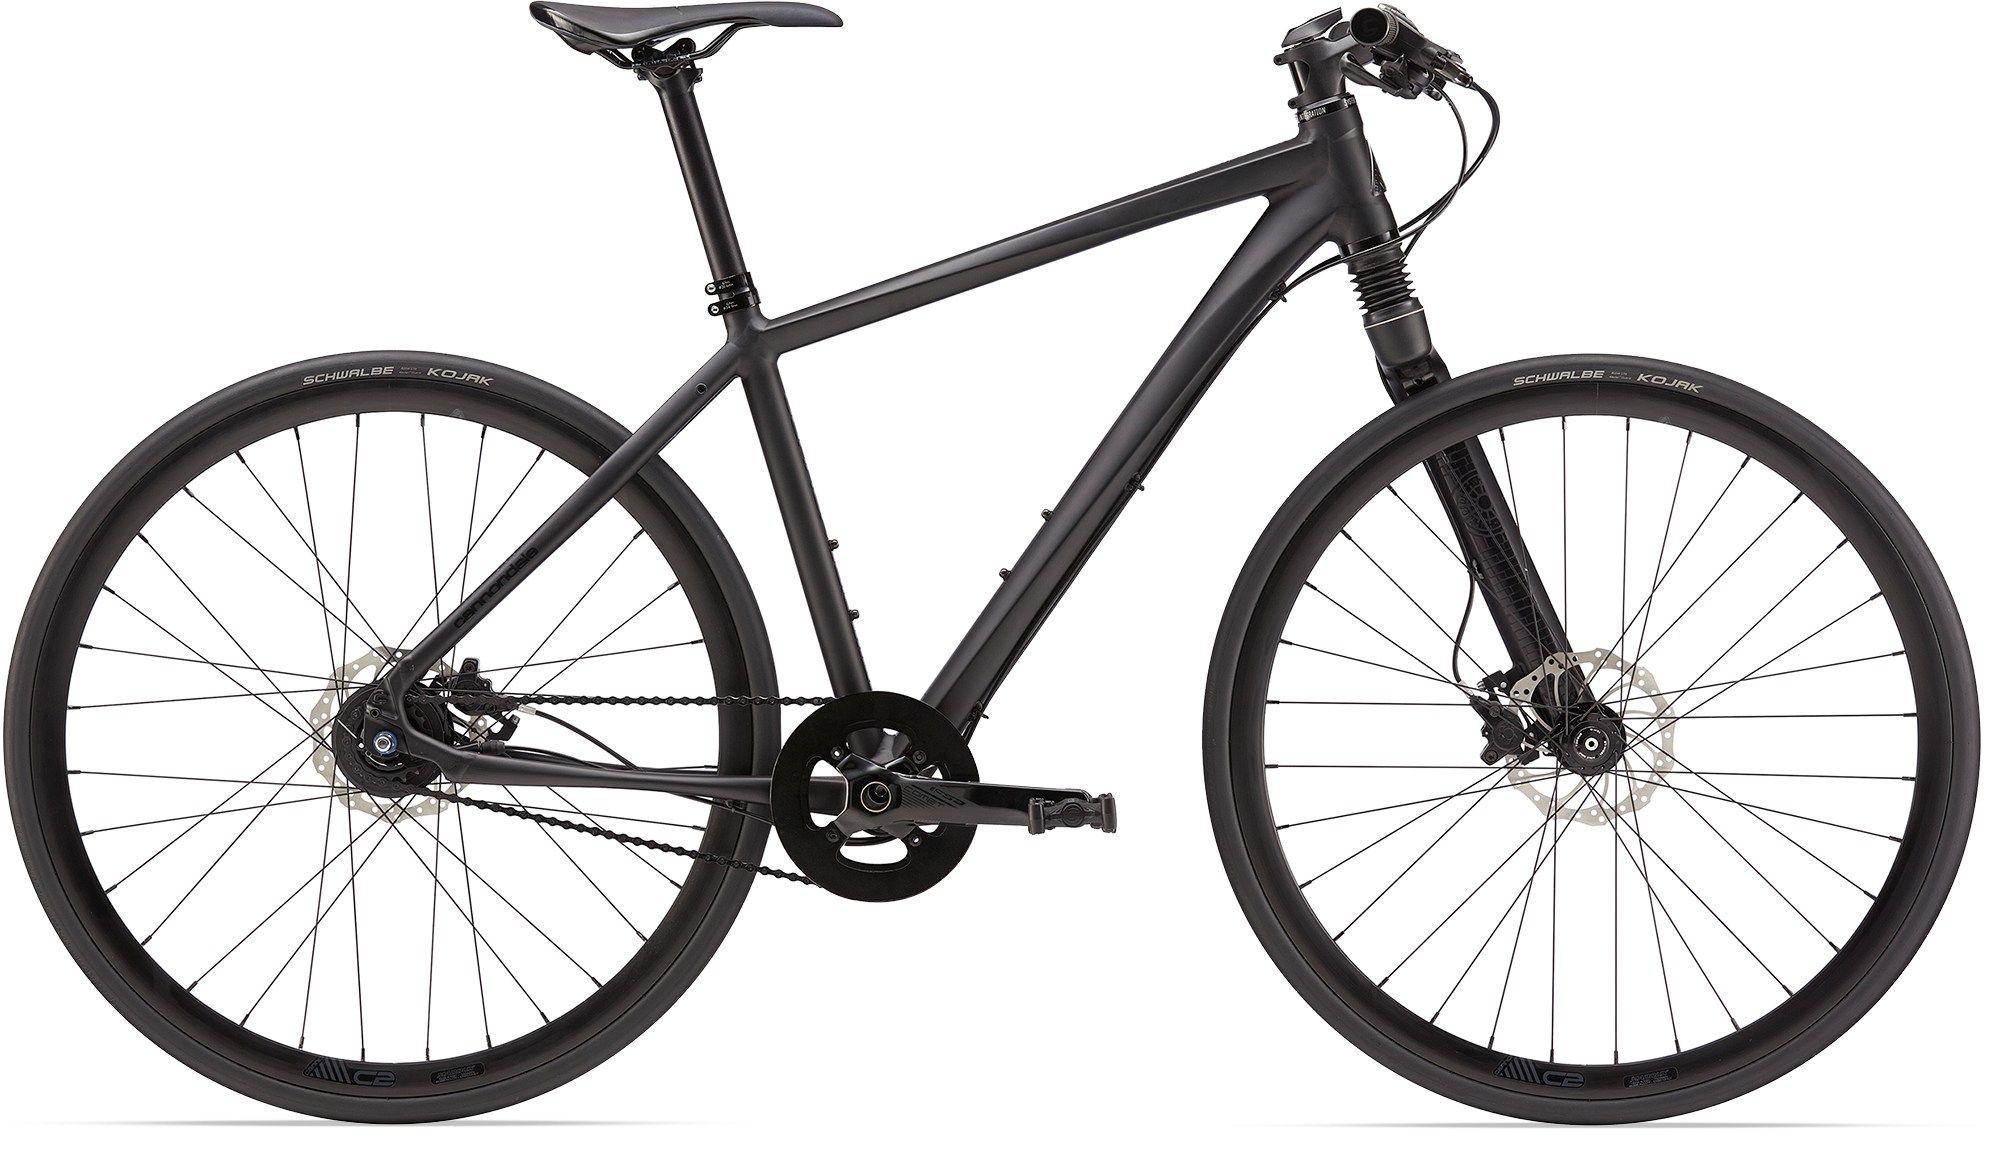 Cannondale Bad Boy 1 Bike 2015 Rei Com Bikes Pinterest